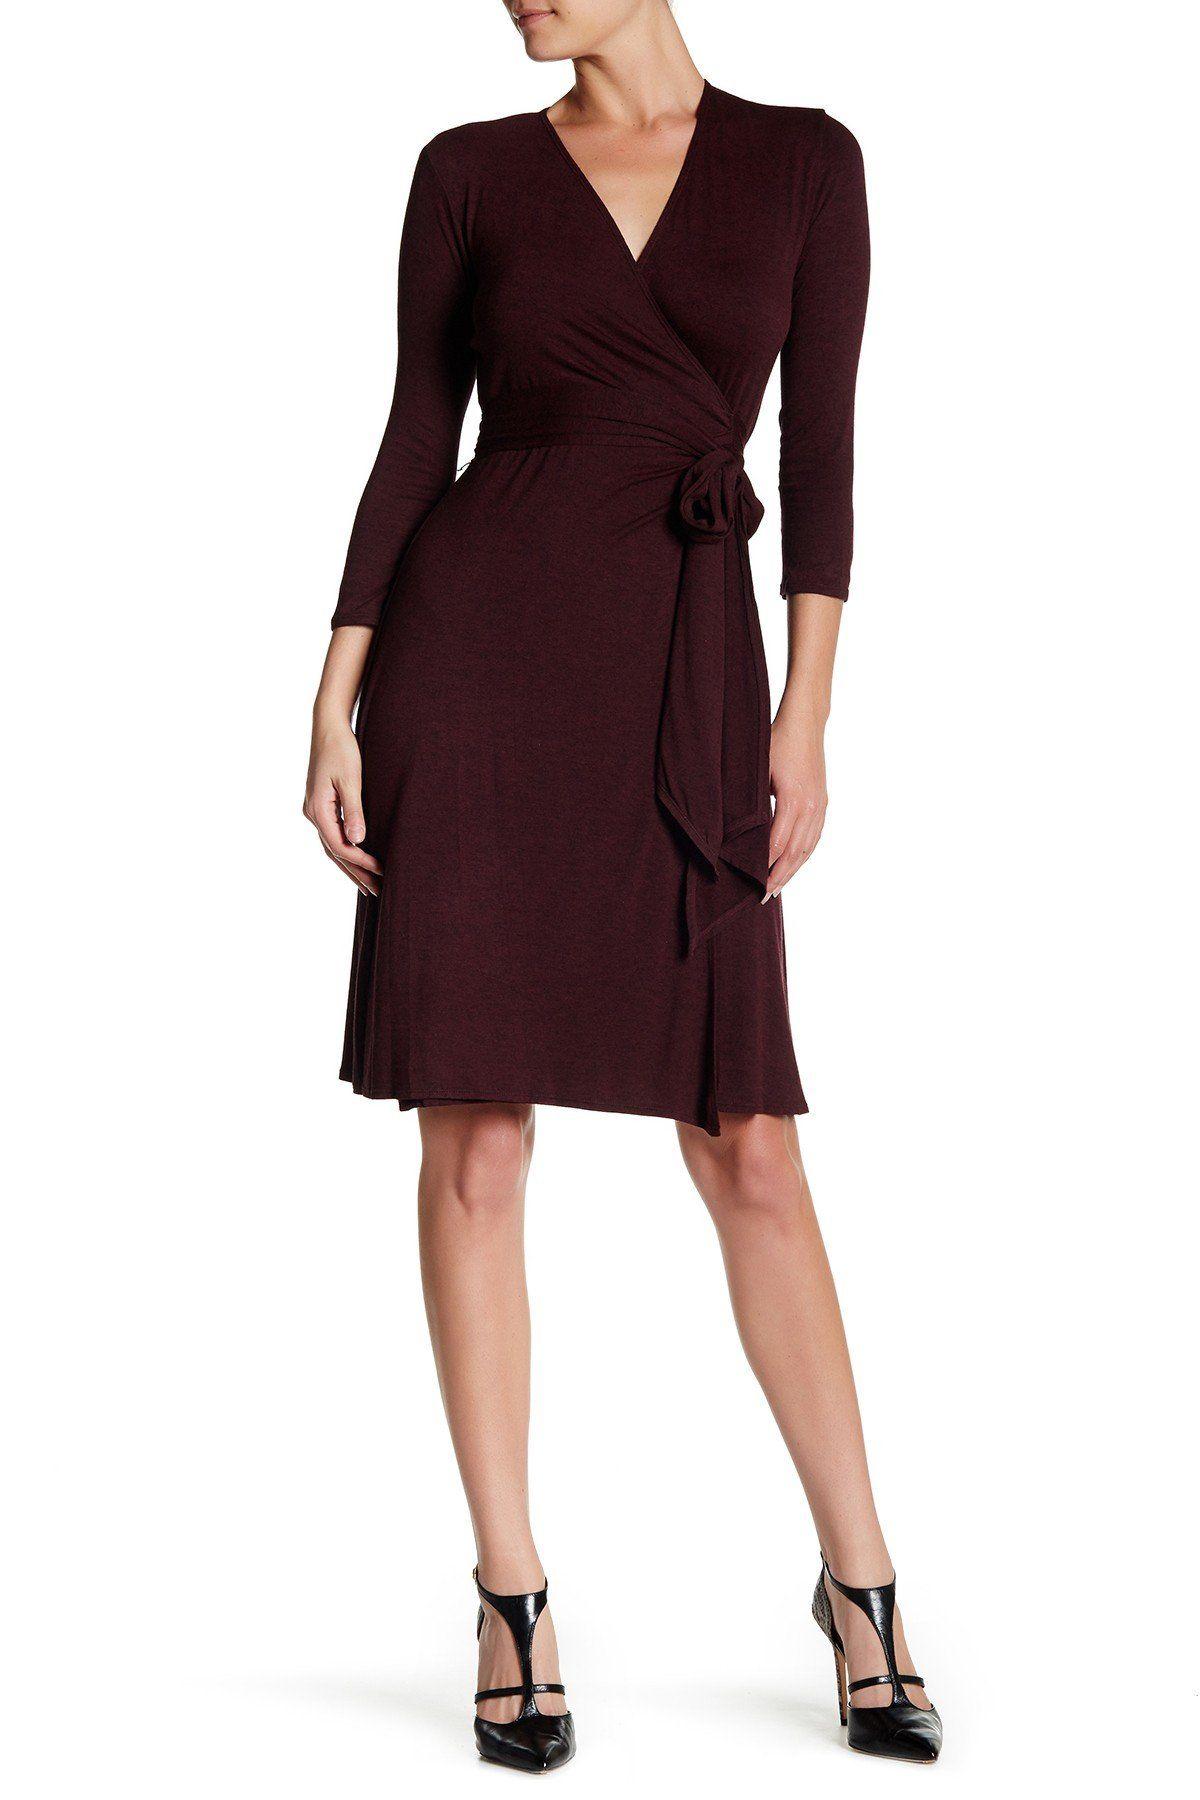 3/4 Length Sleeve Knit Wrap Dress Wrap dress, White v